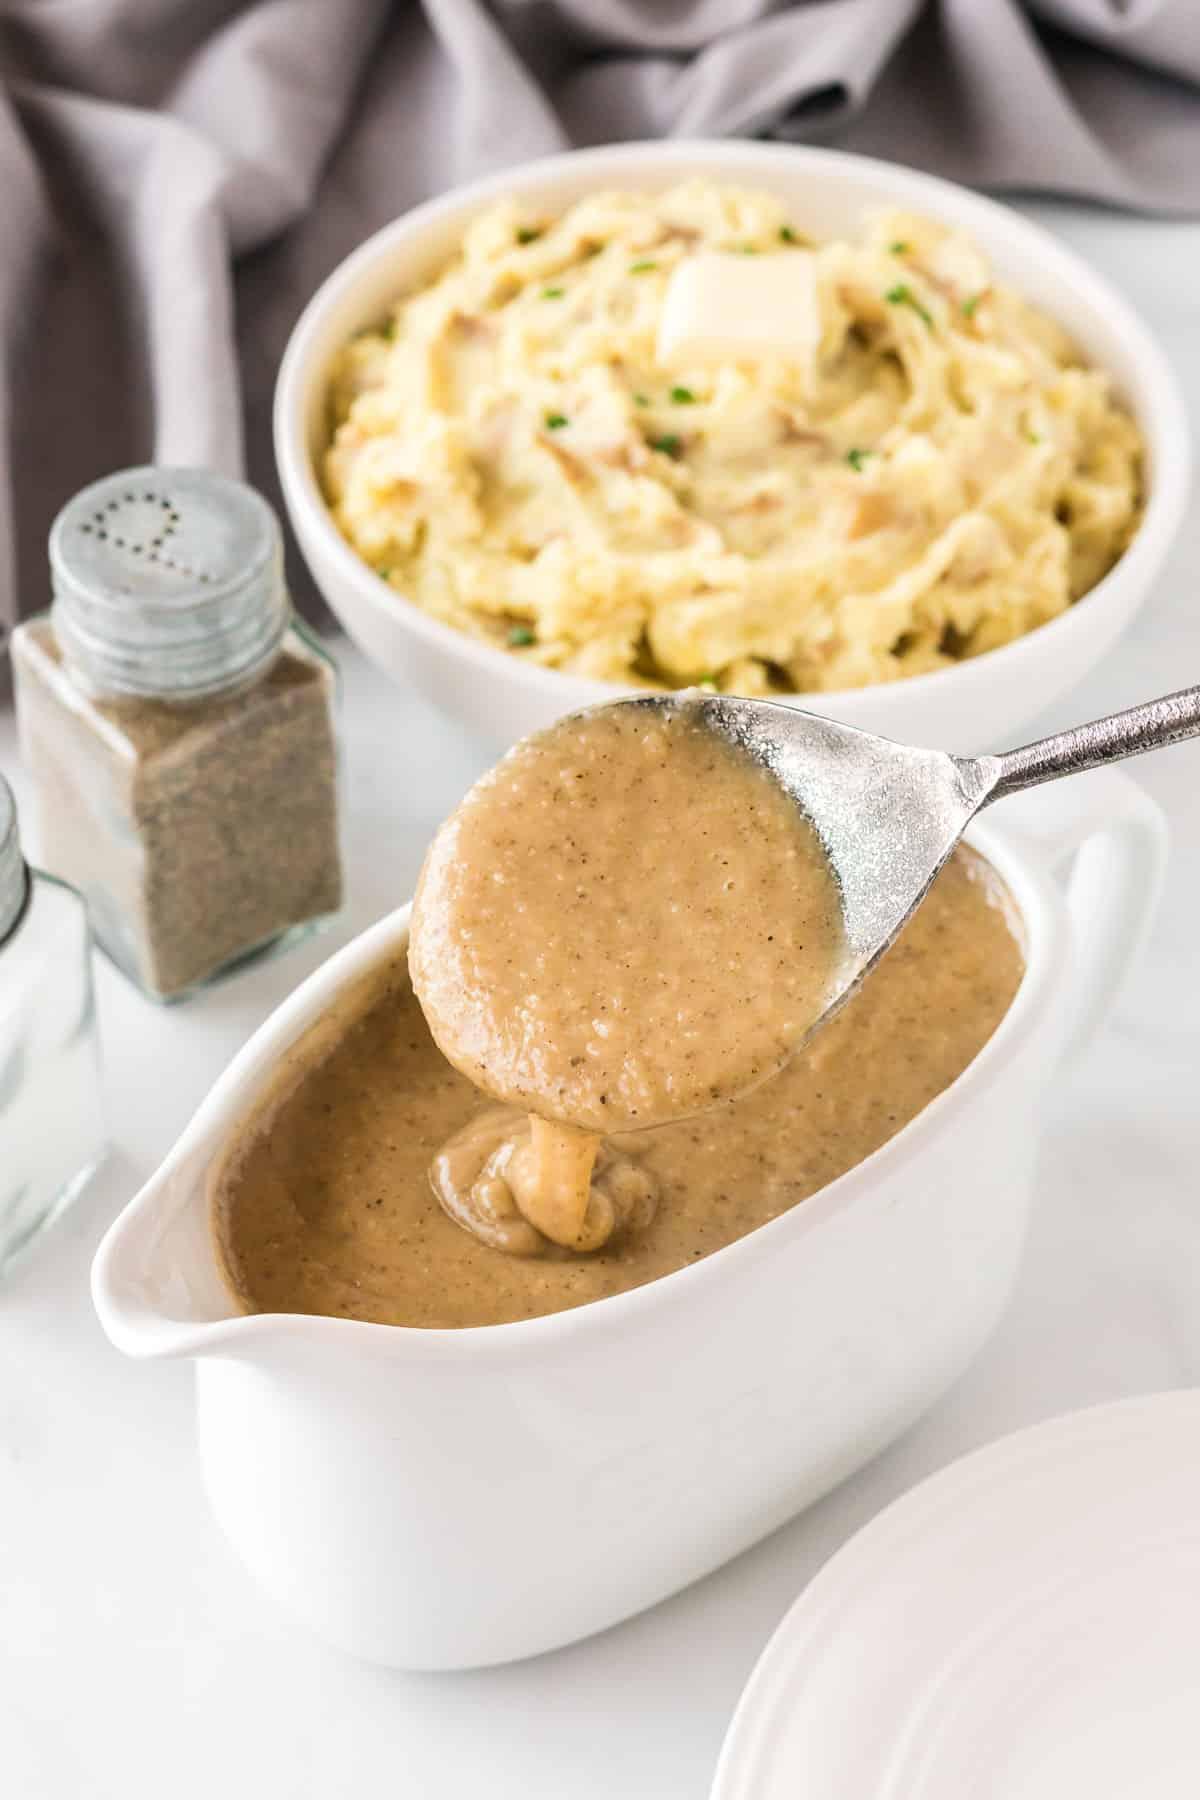 spoon in the veggie gravy